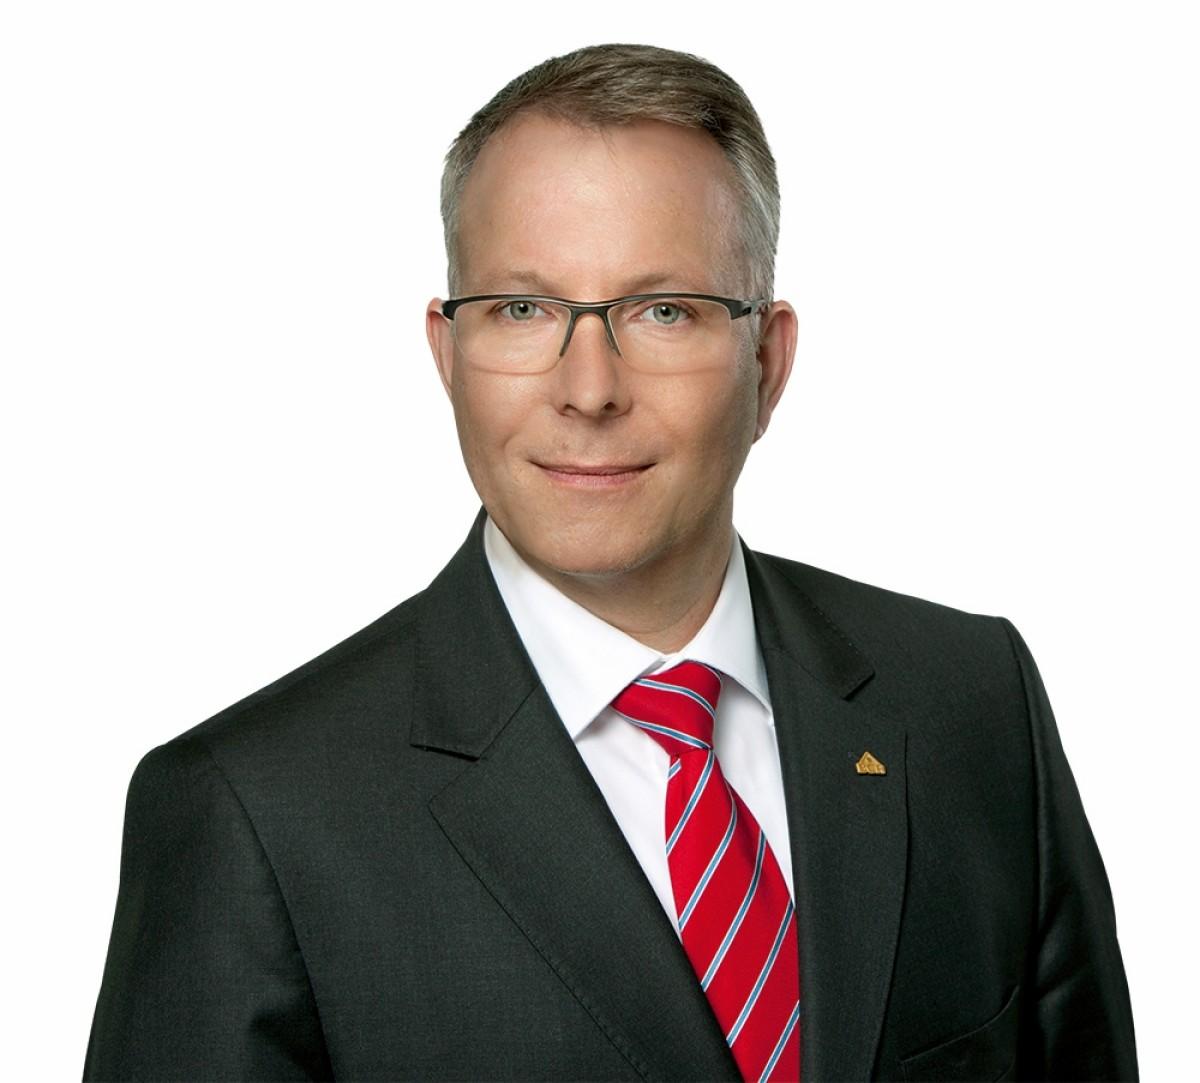 Dr. Frank Ulbricht